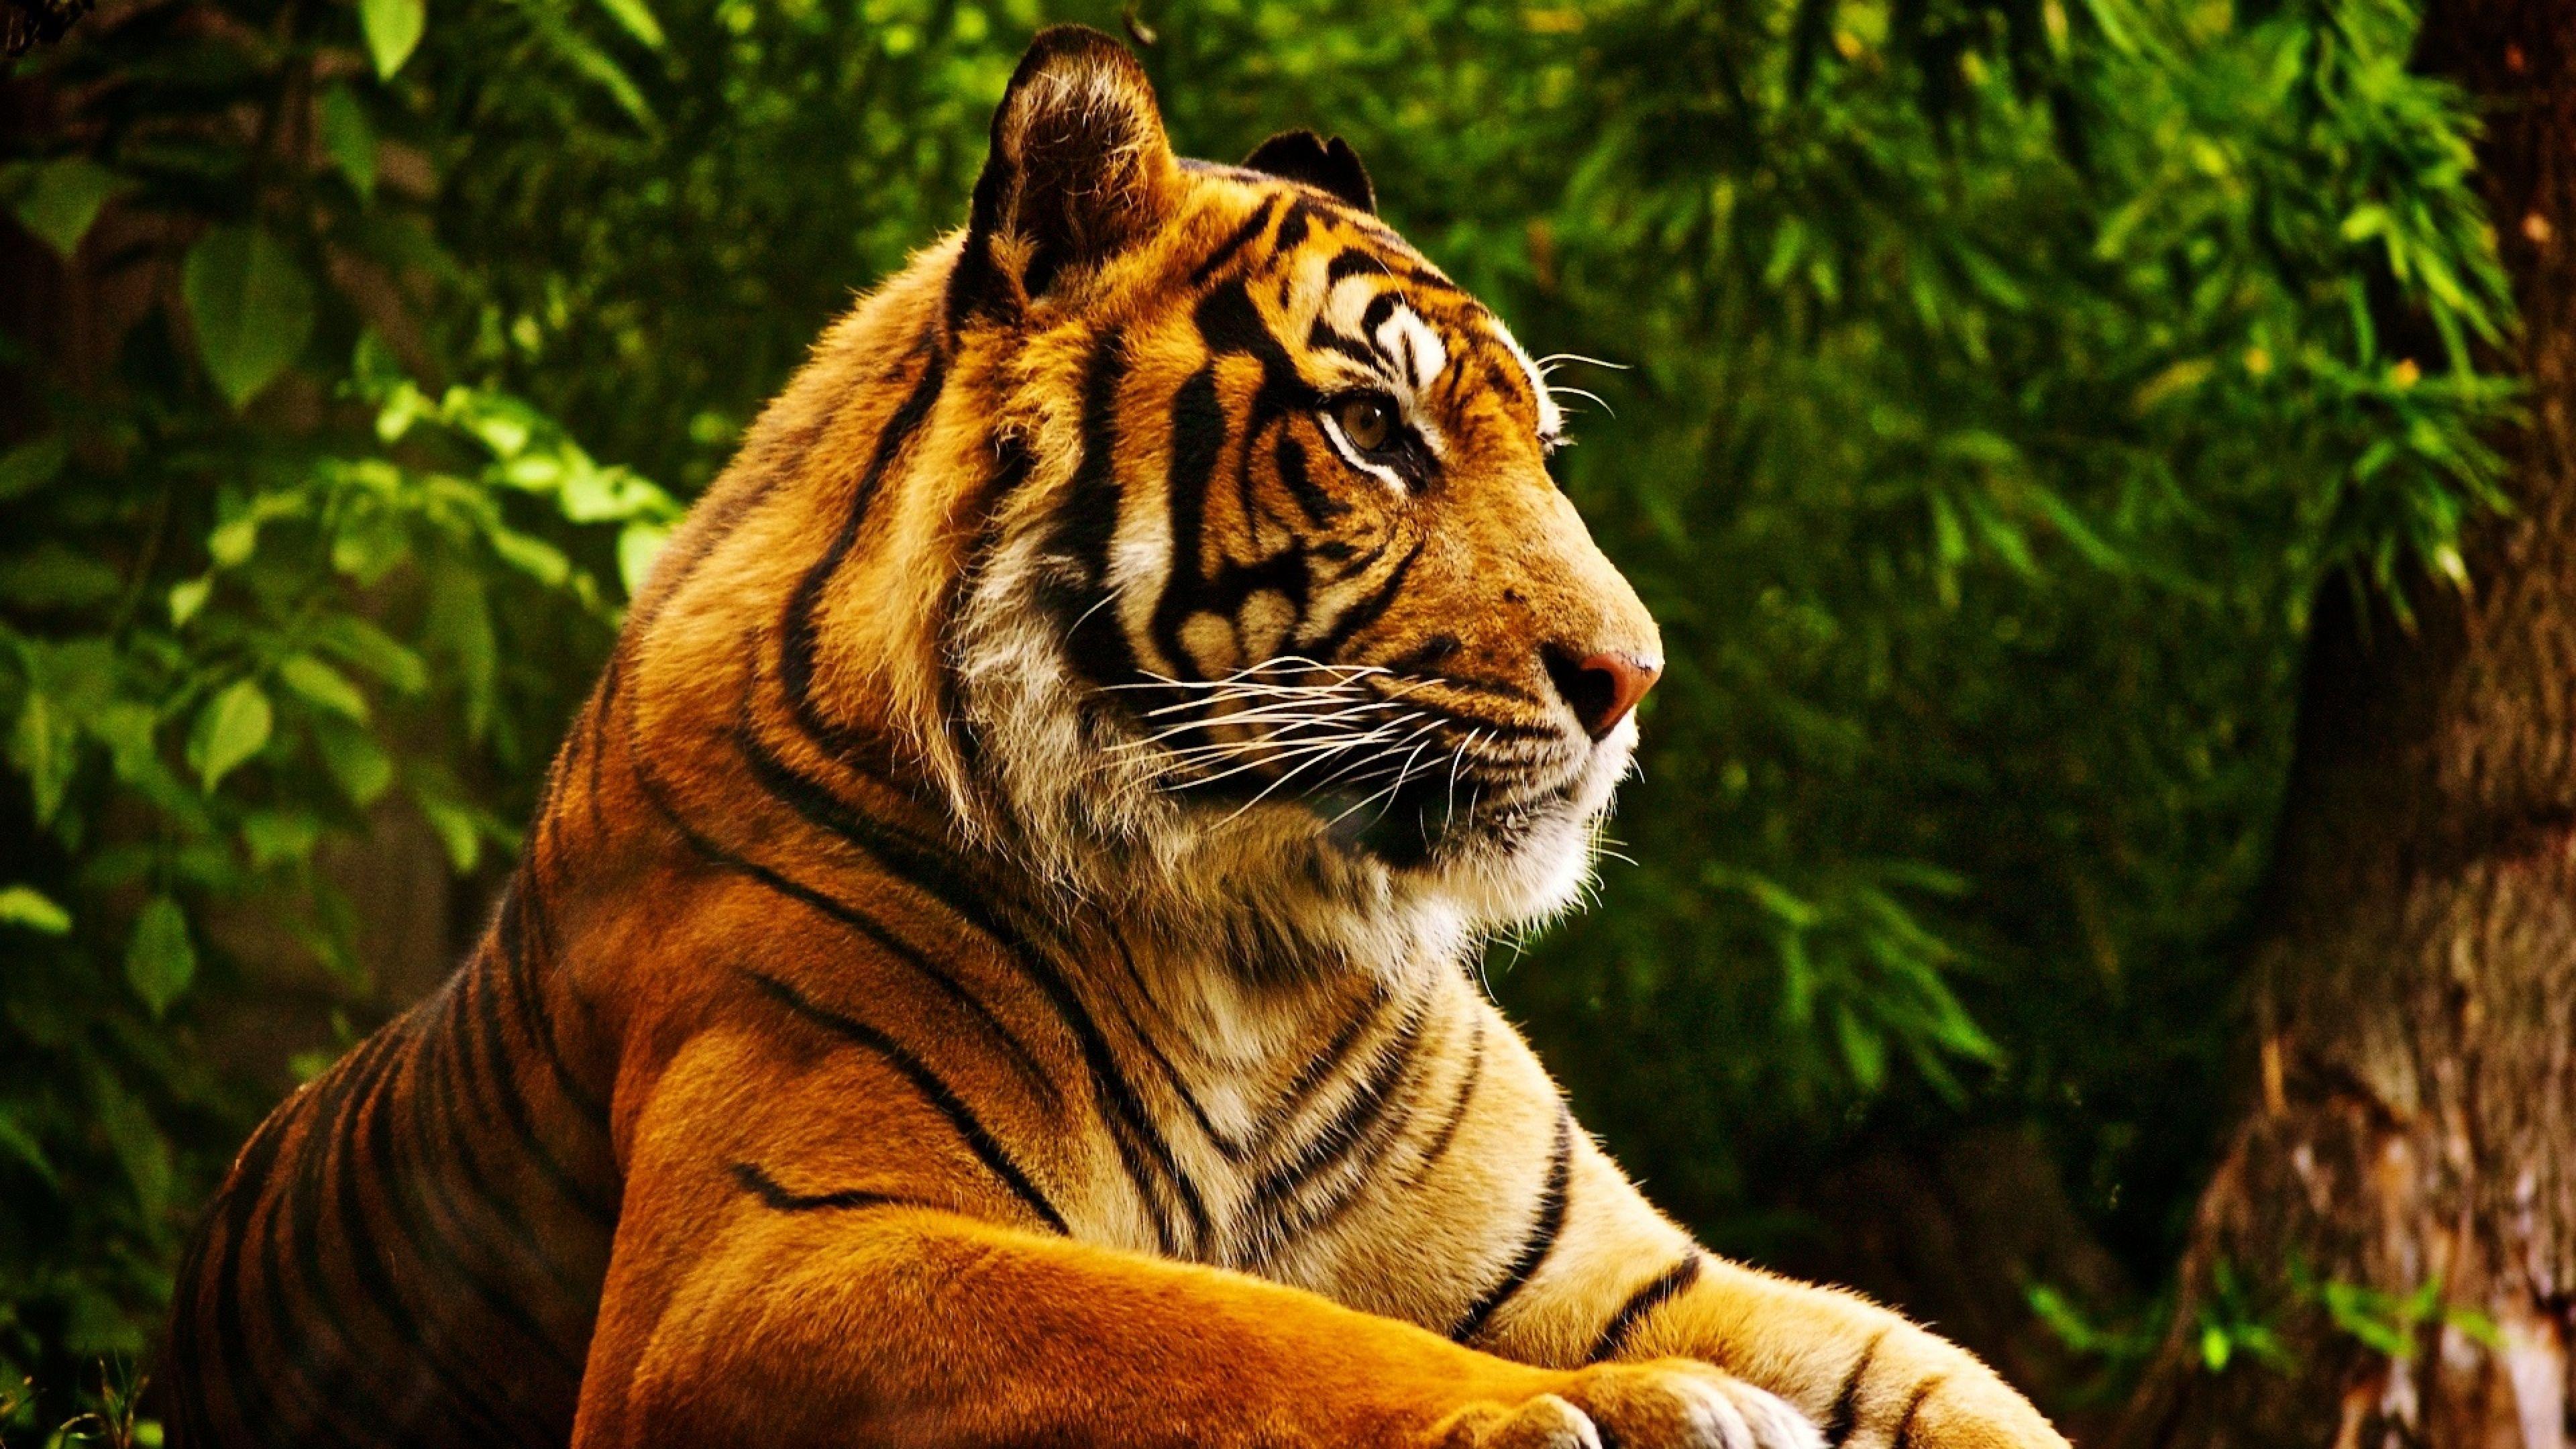 Tiger Computer Wallpapers Desktop Backgrounds 3840x2160 ID441761 3840x2160